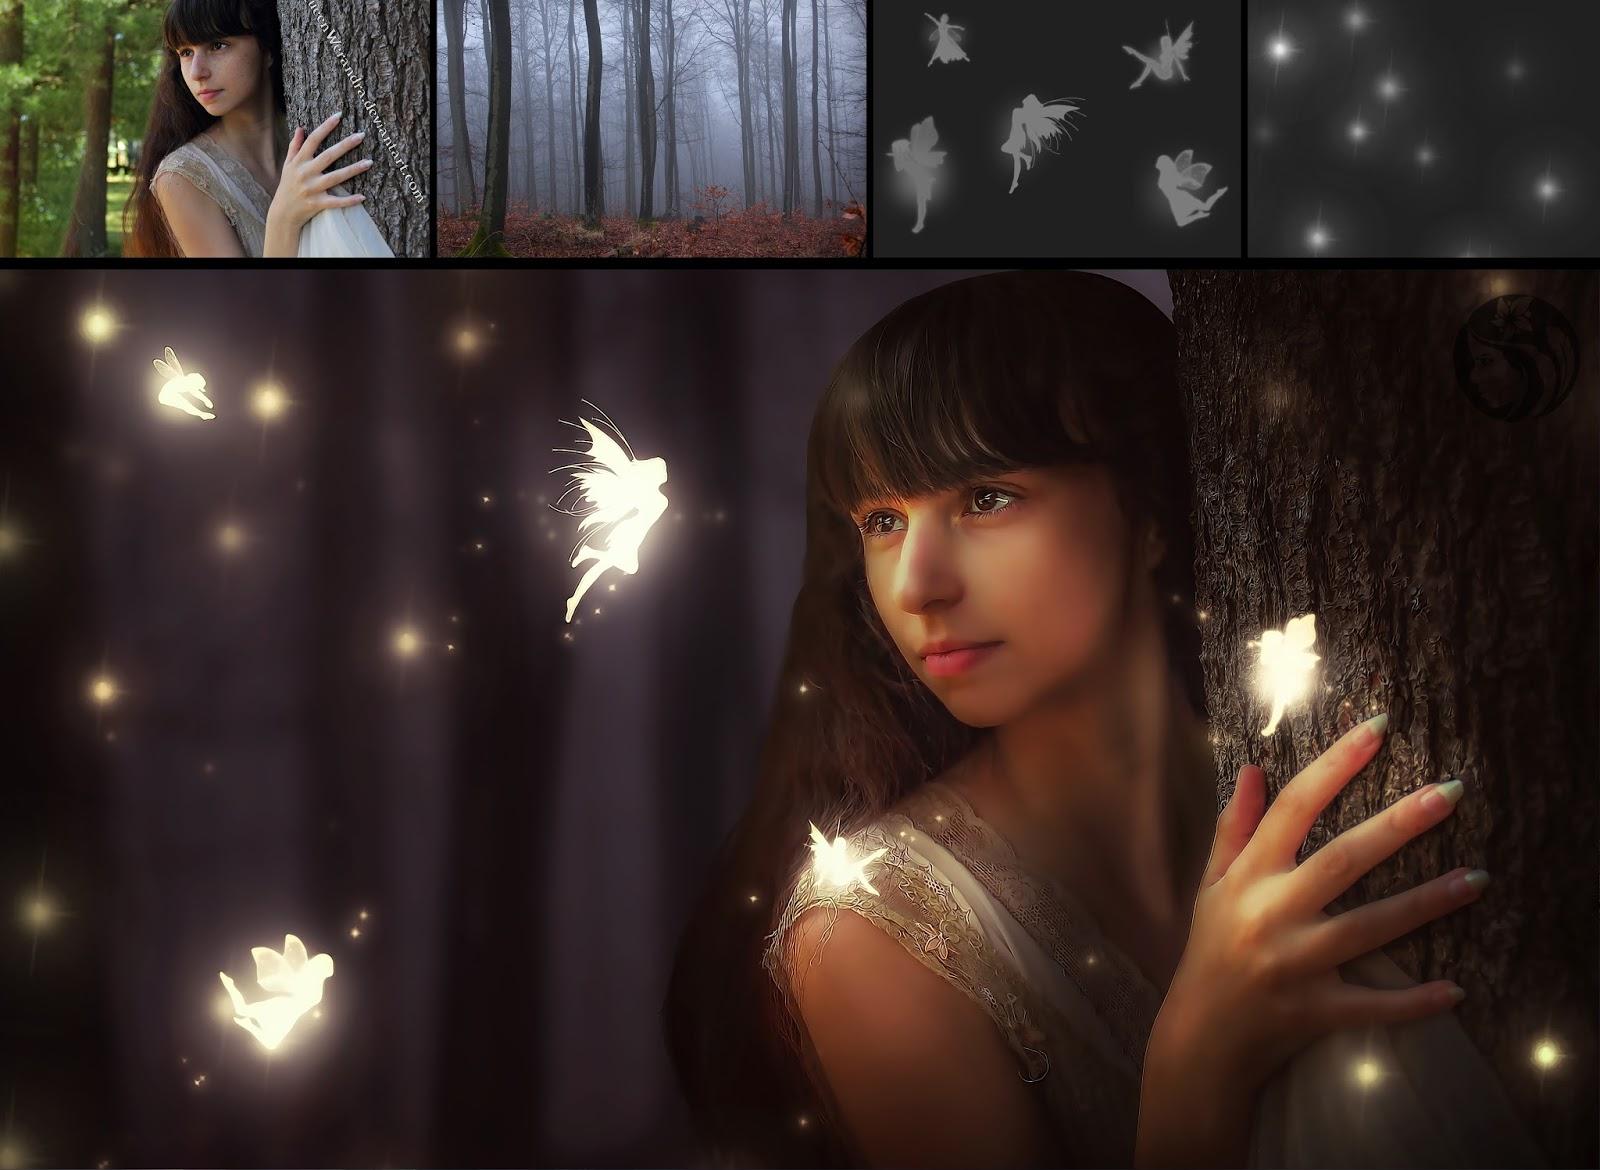 Fairy forest photo manipulation photoshop tutorial baditri Image collections